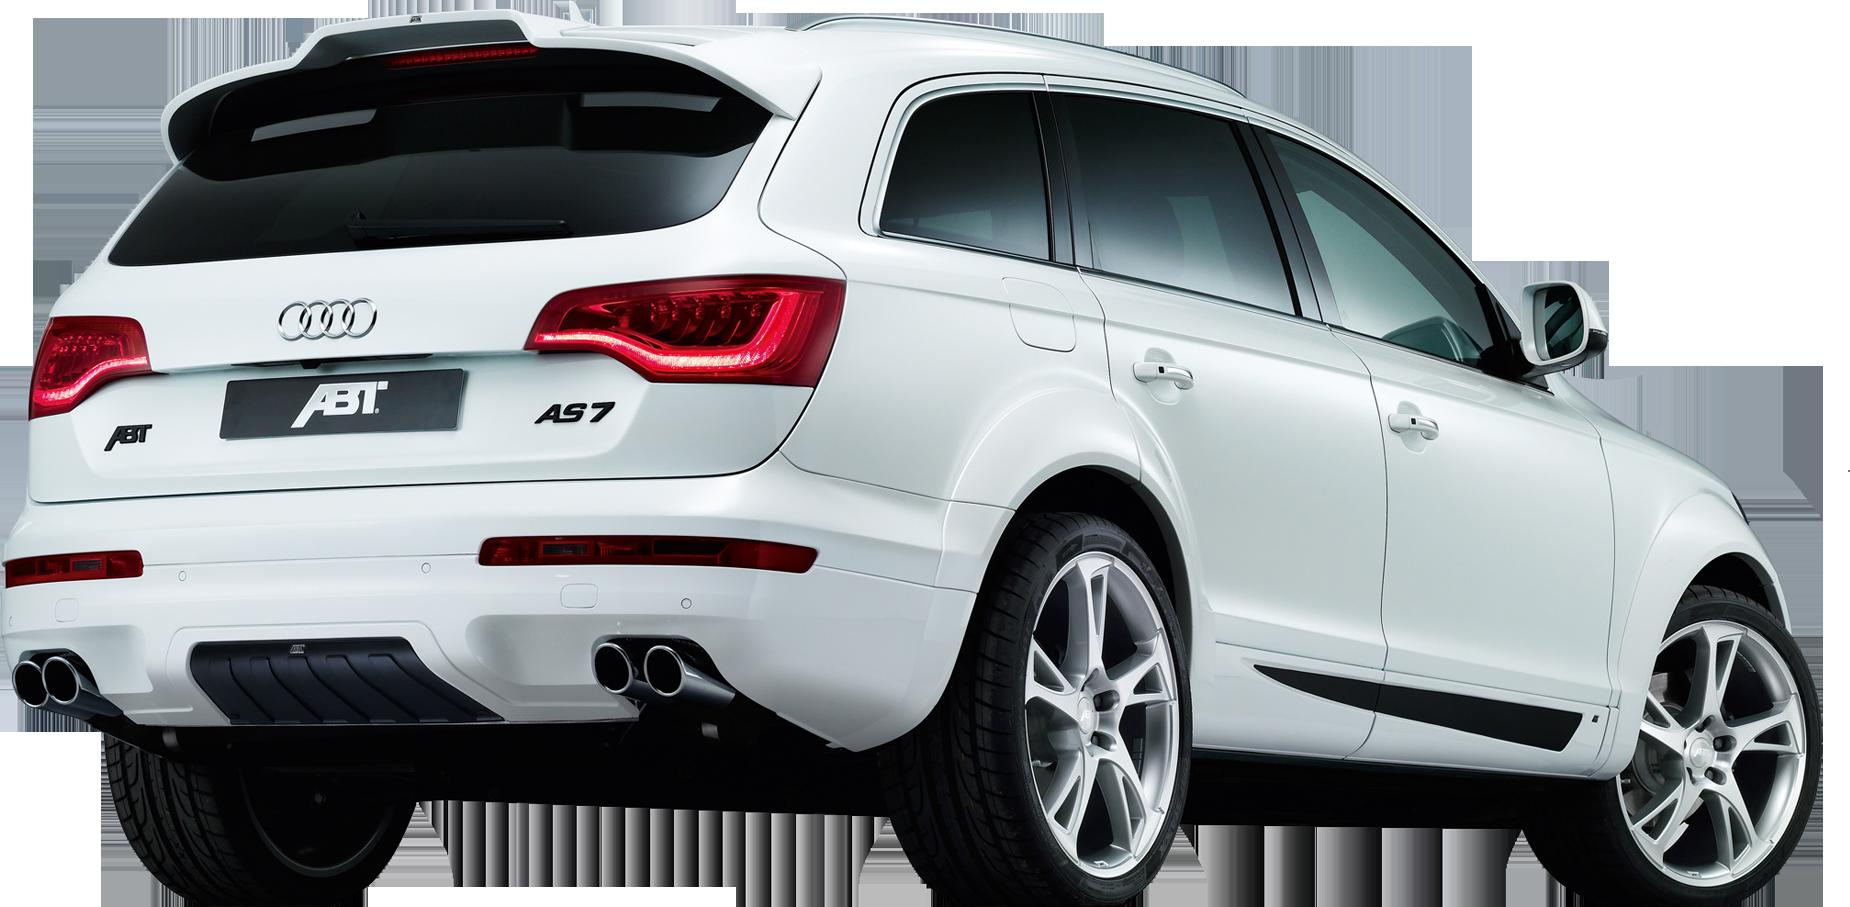 White Audi PNG Image